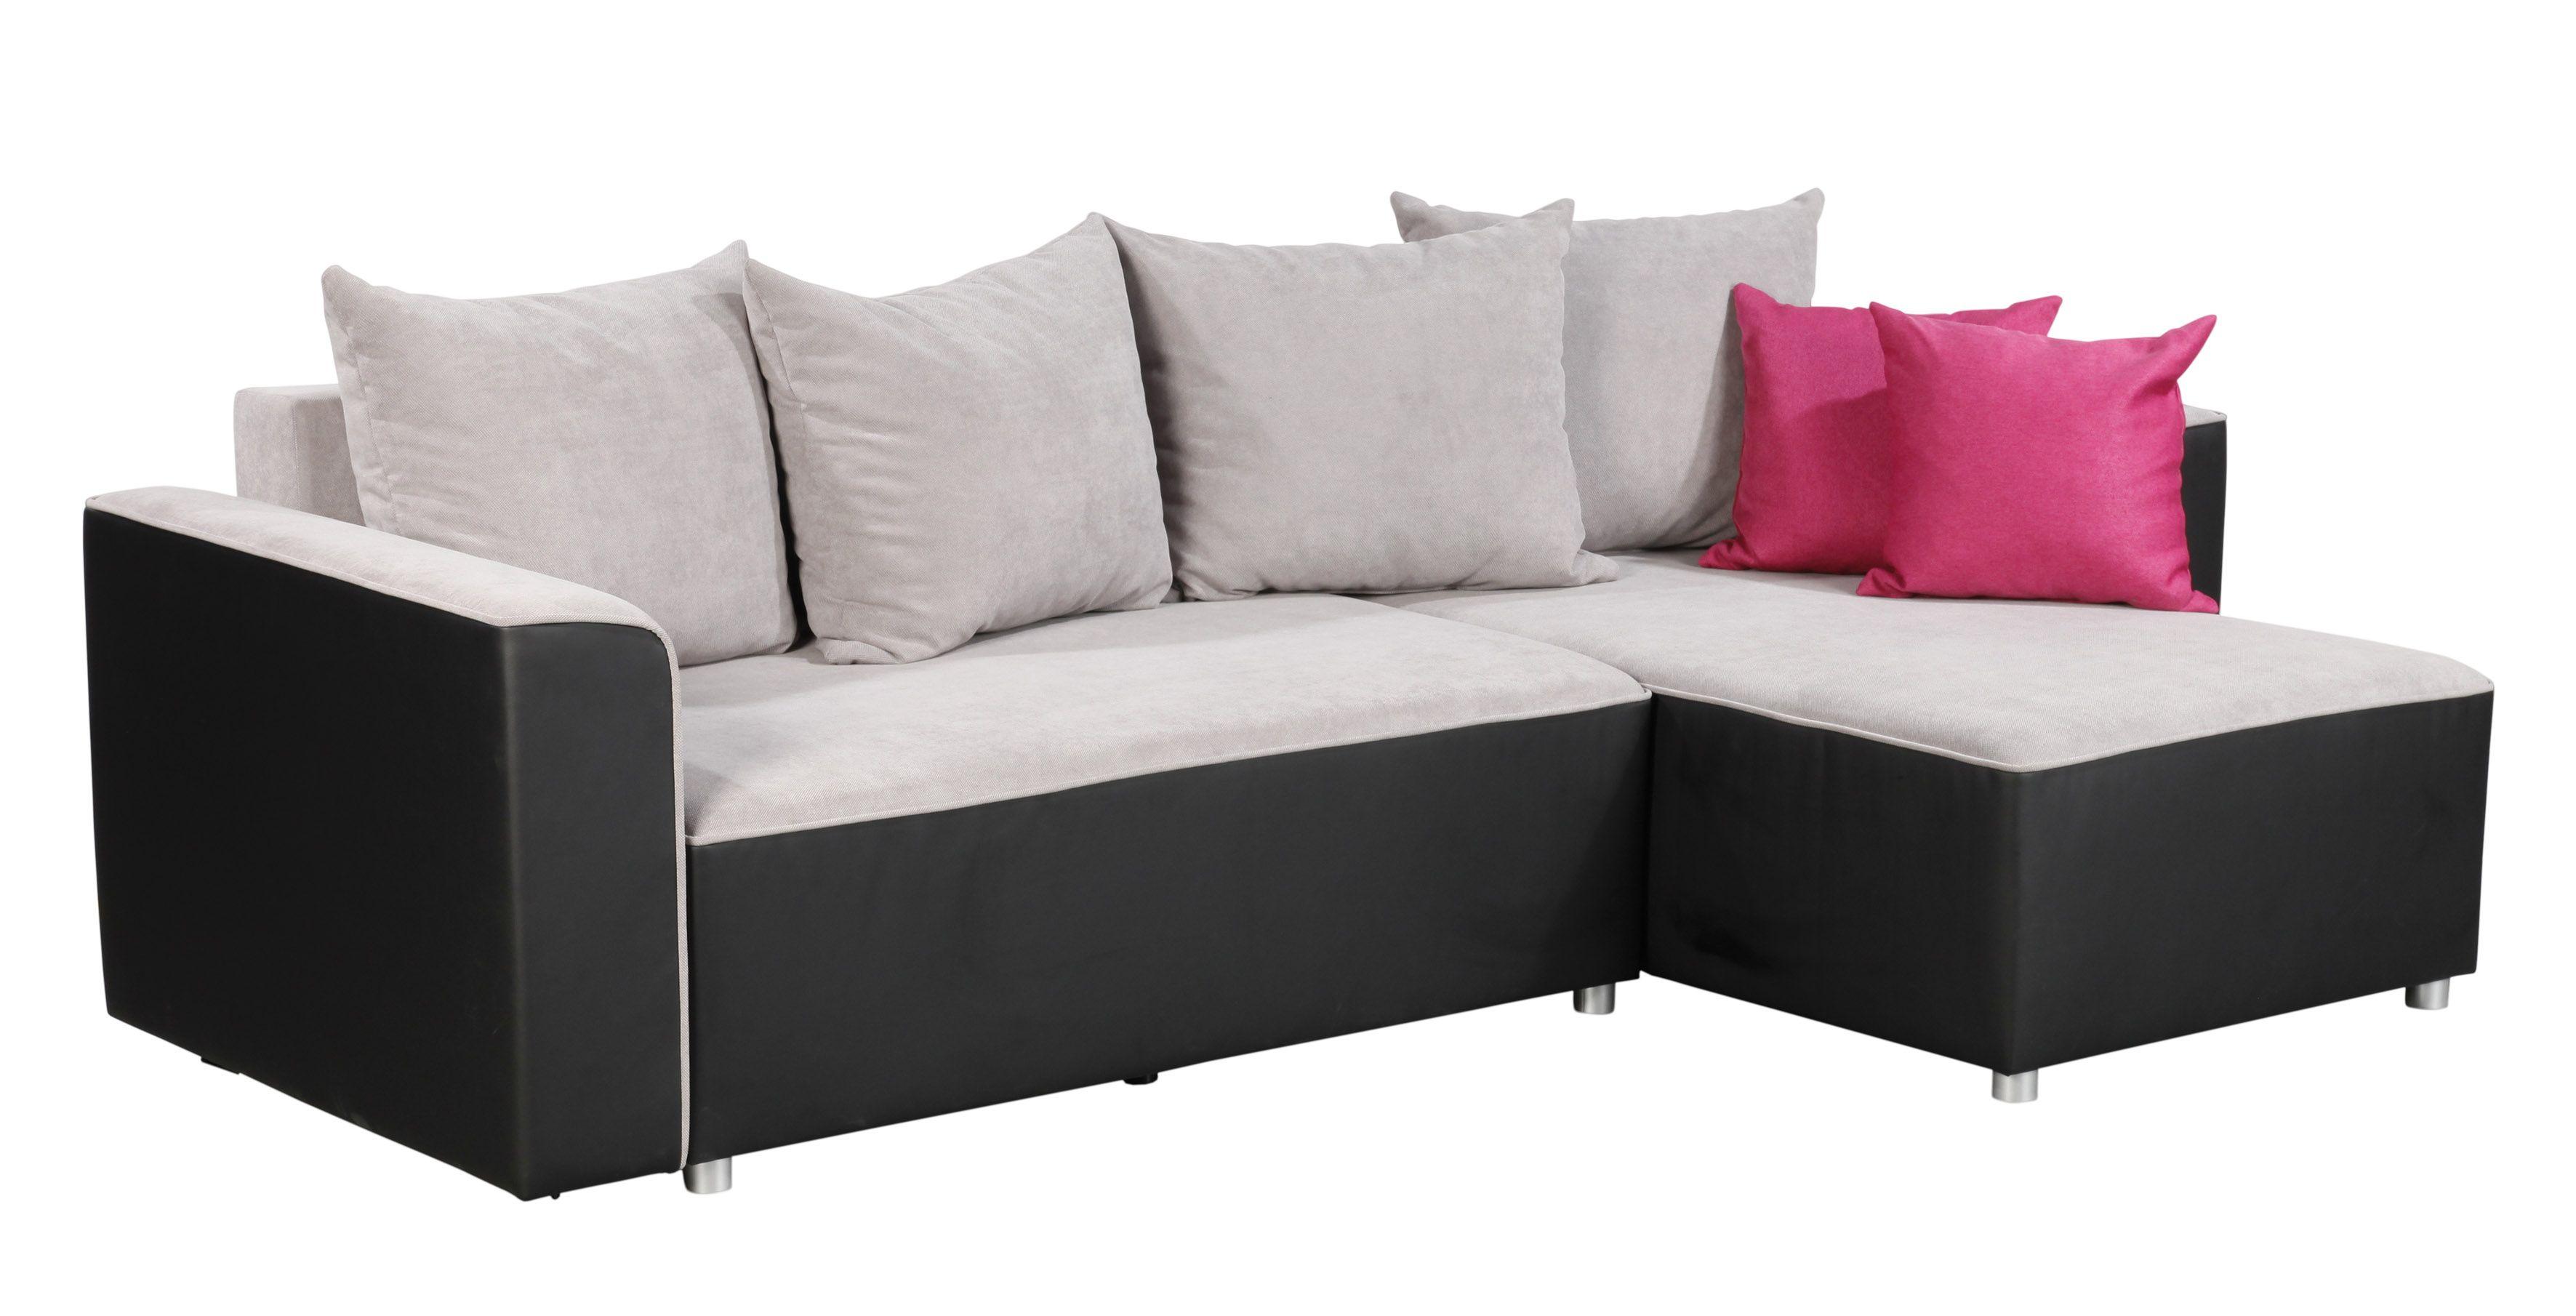 Sklepy Meblowe Abra Outdoor Sectional Sofa Sectional Sofa Sectional Couch